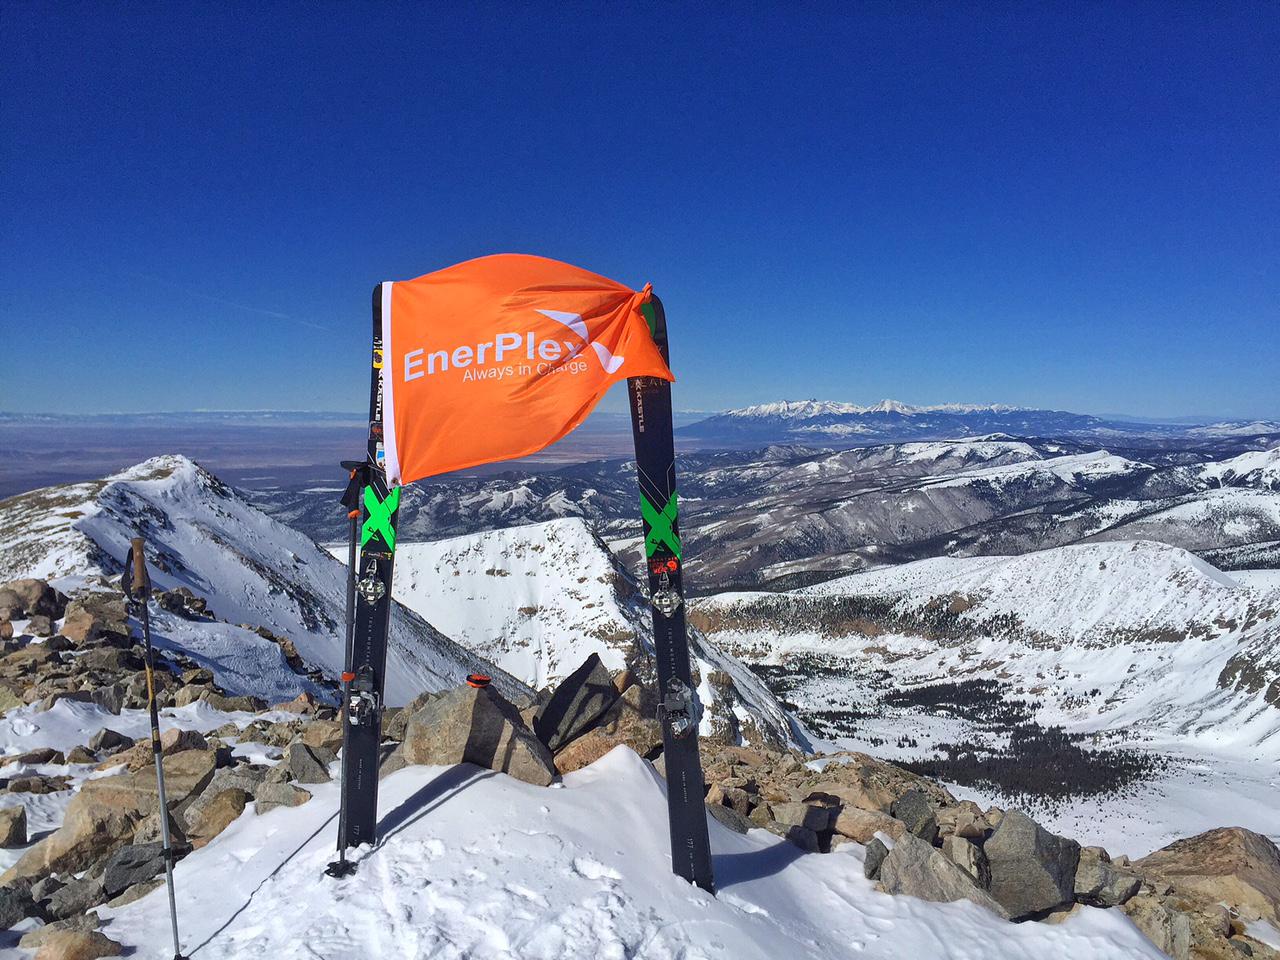 Peak #8: Culebra Peak 14,047' - February 12, 2016